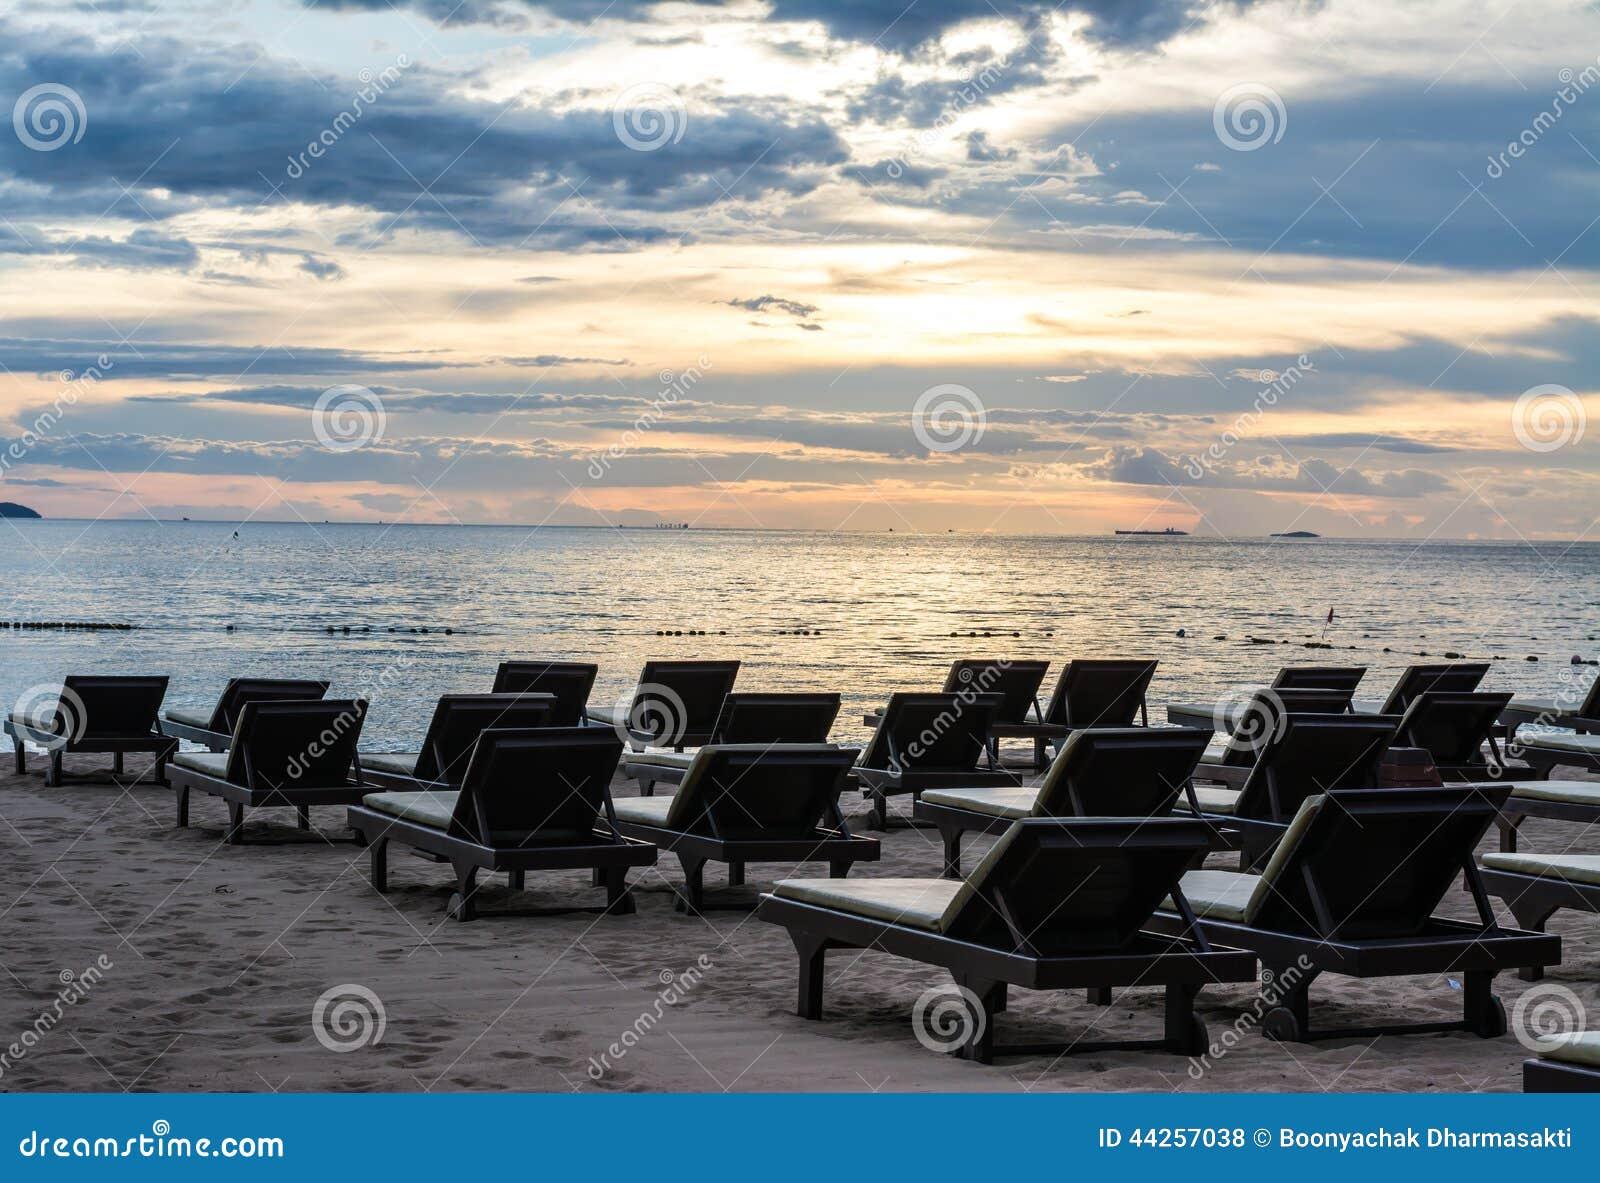 Adirondack Chairs On Beach Sunset